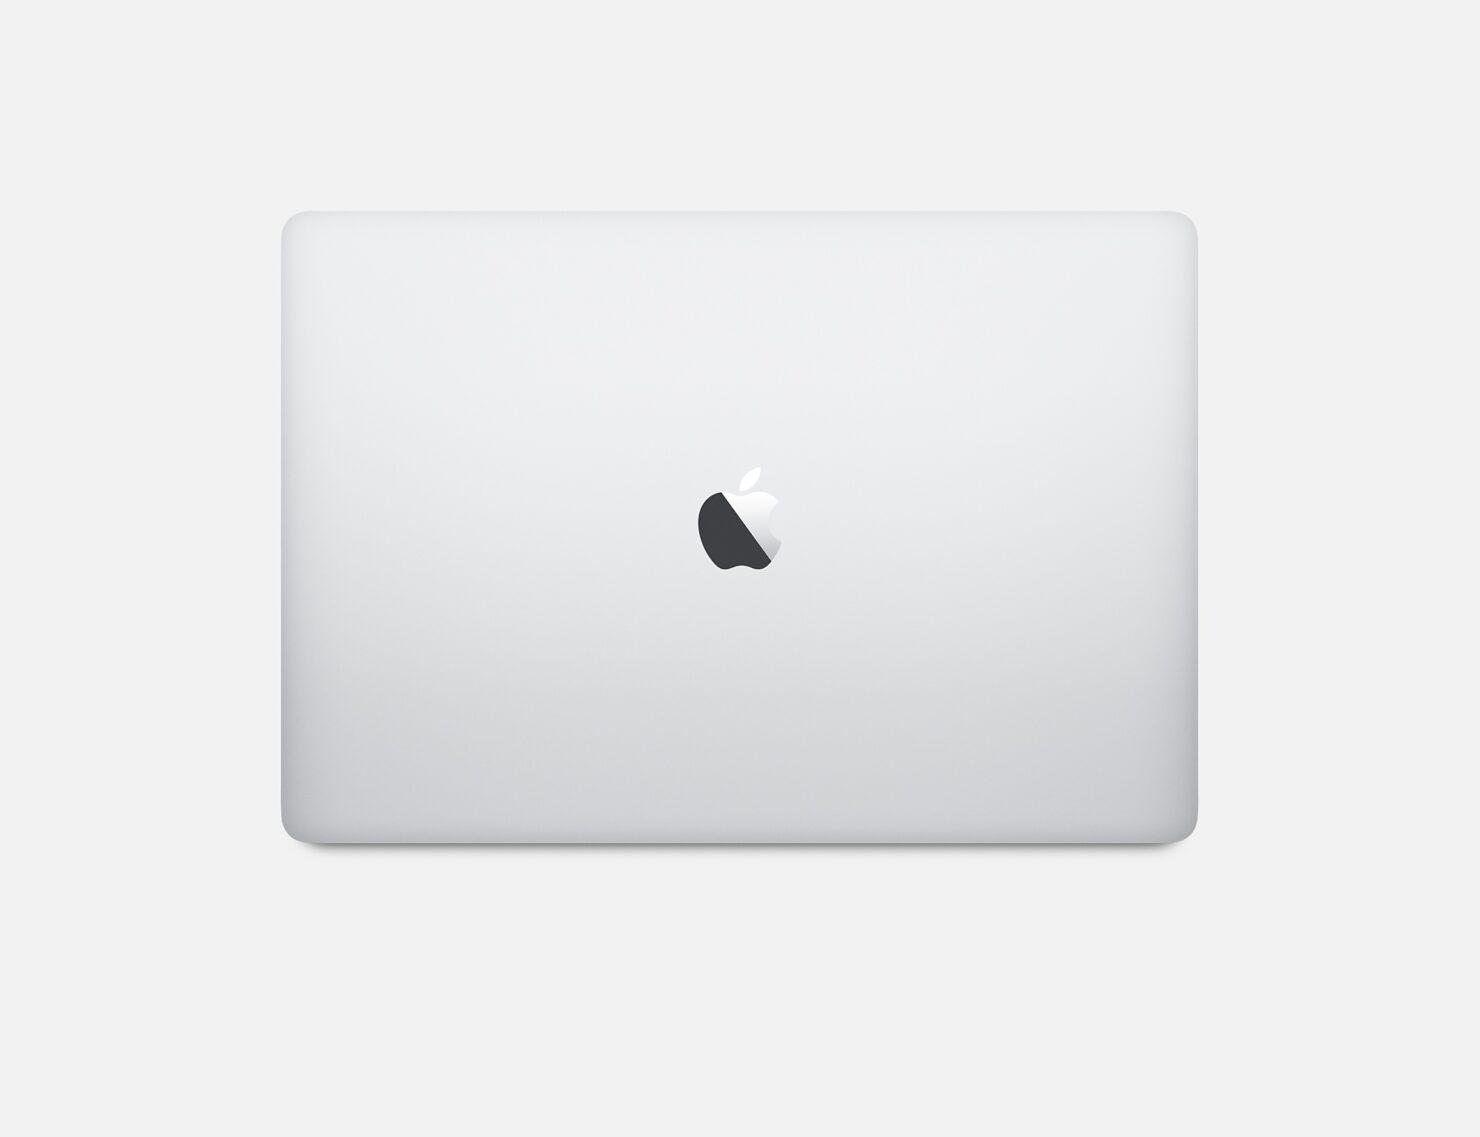 Consumer Reports retesting MacBook Pro battery